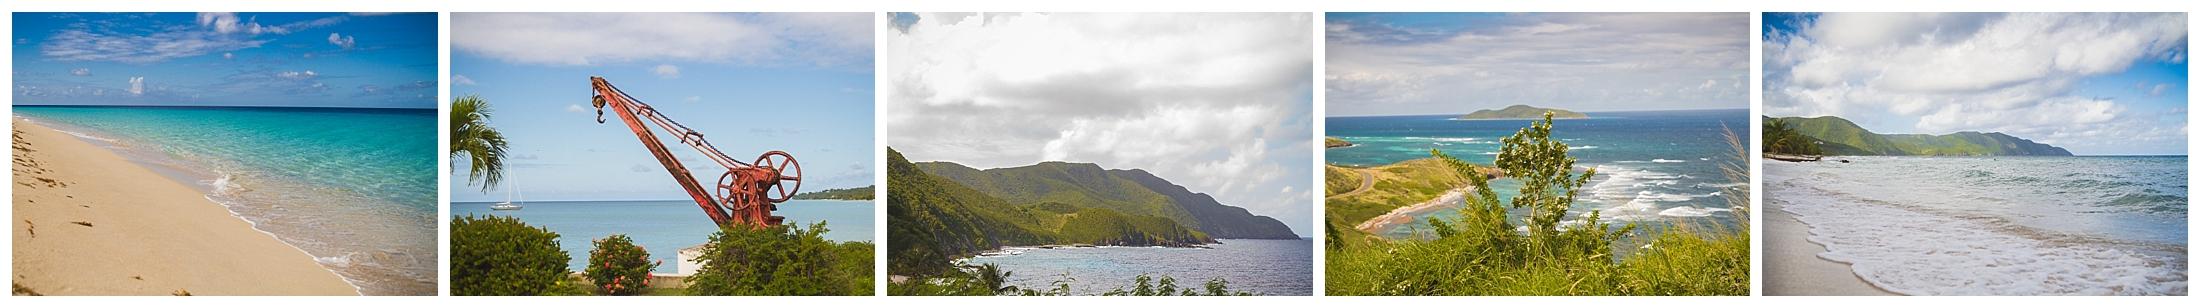 St-Croix-Trip-Itinerary-SSPTravels9.jpg